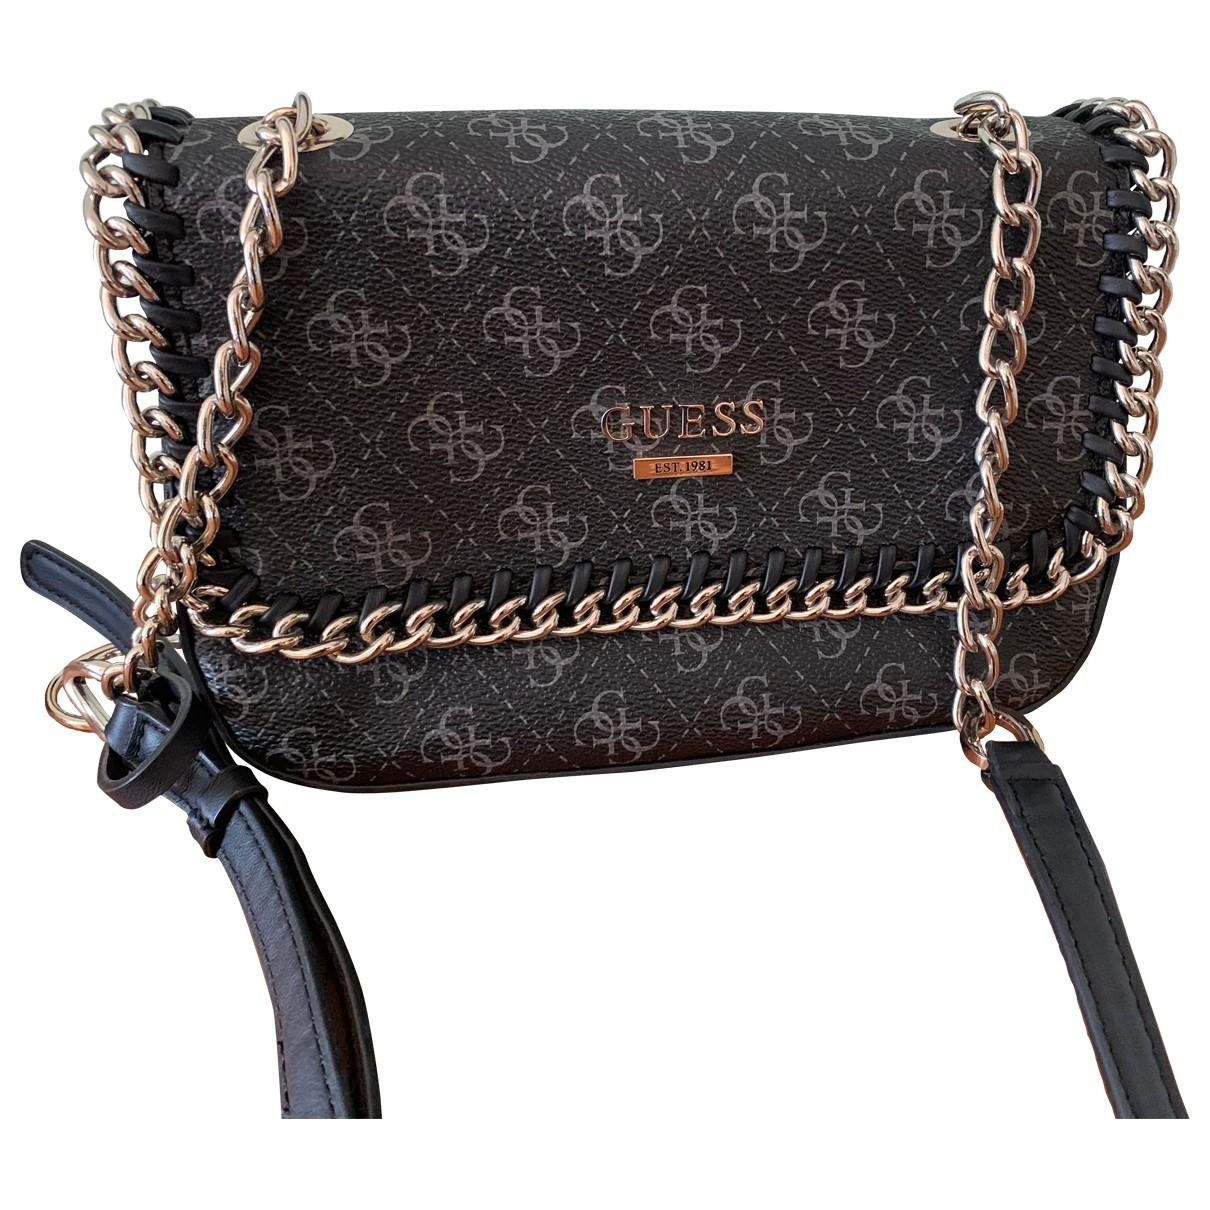 Guess \N Black Clutch bag for Women \N